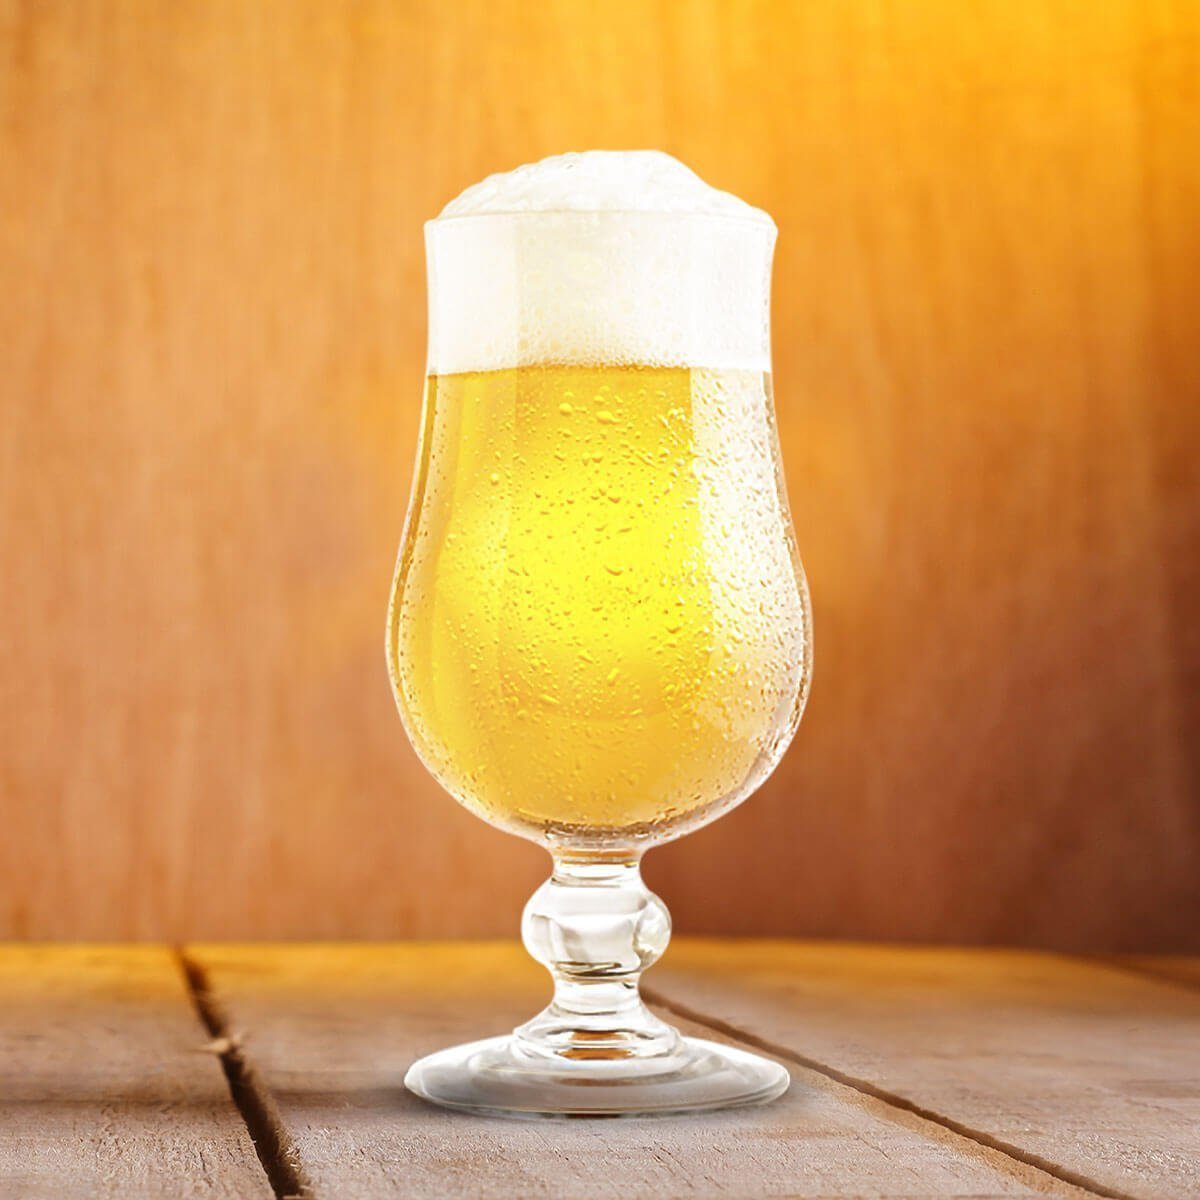 Belgian Blond Ale in a Tulip Glass